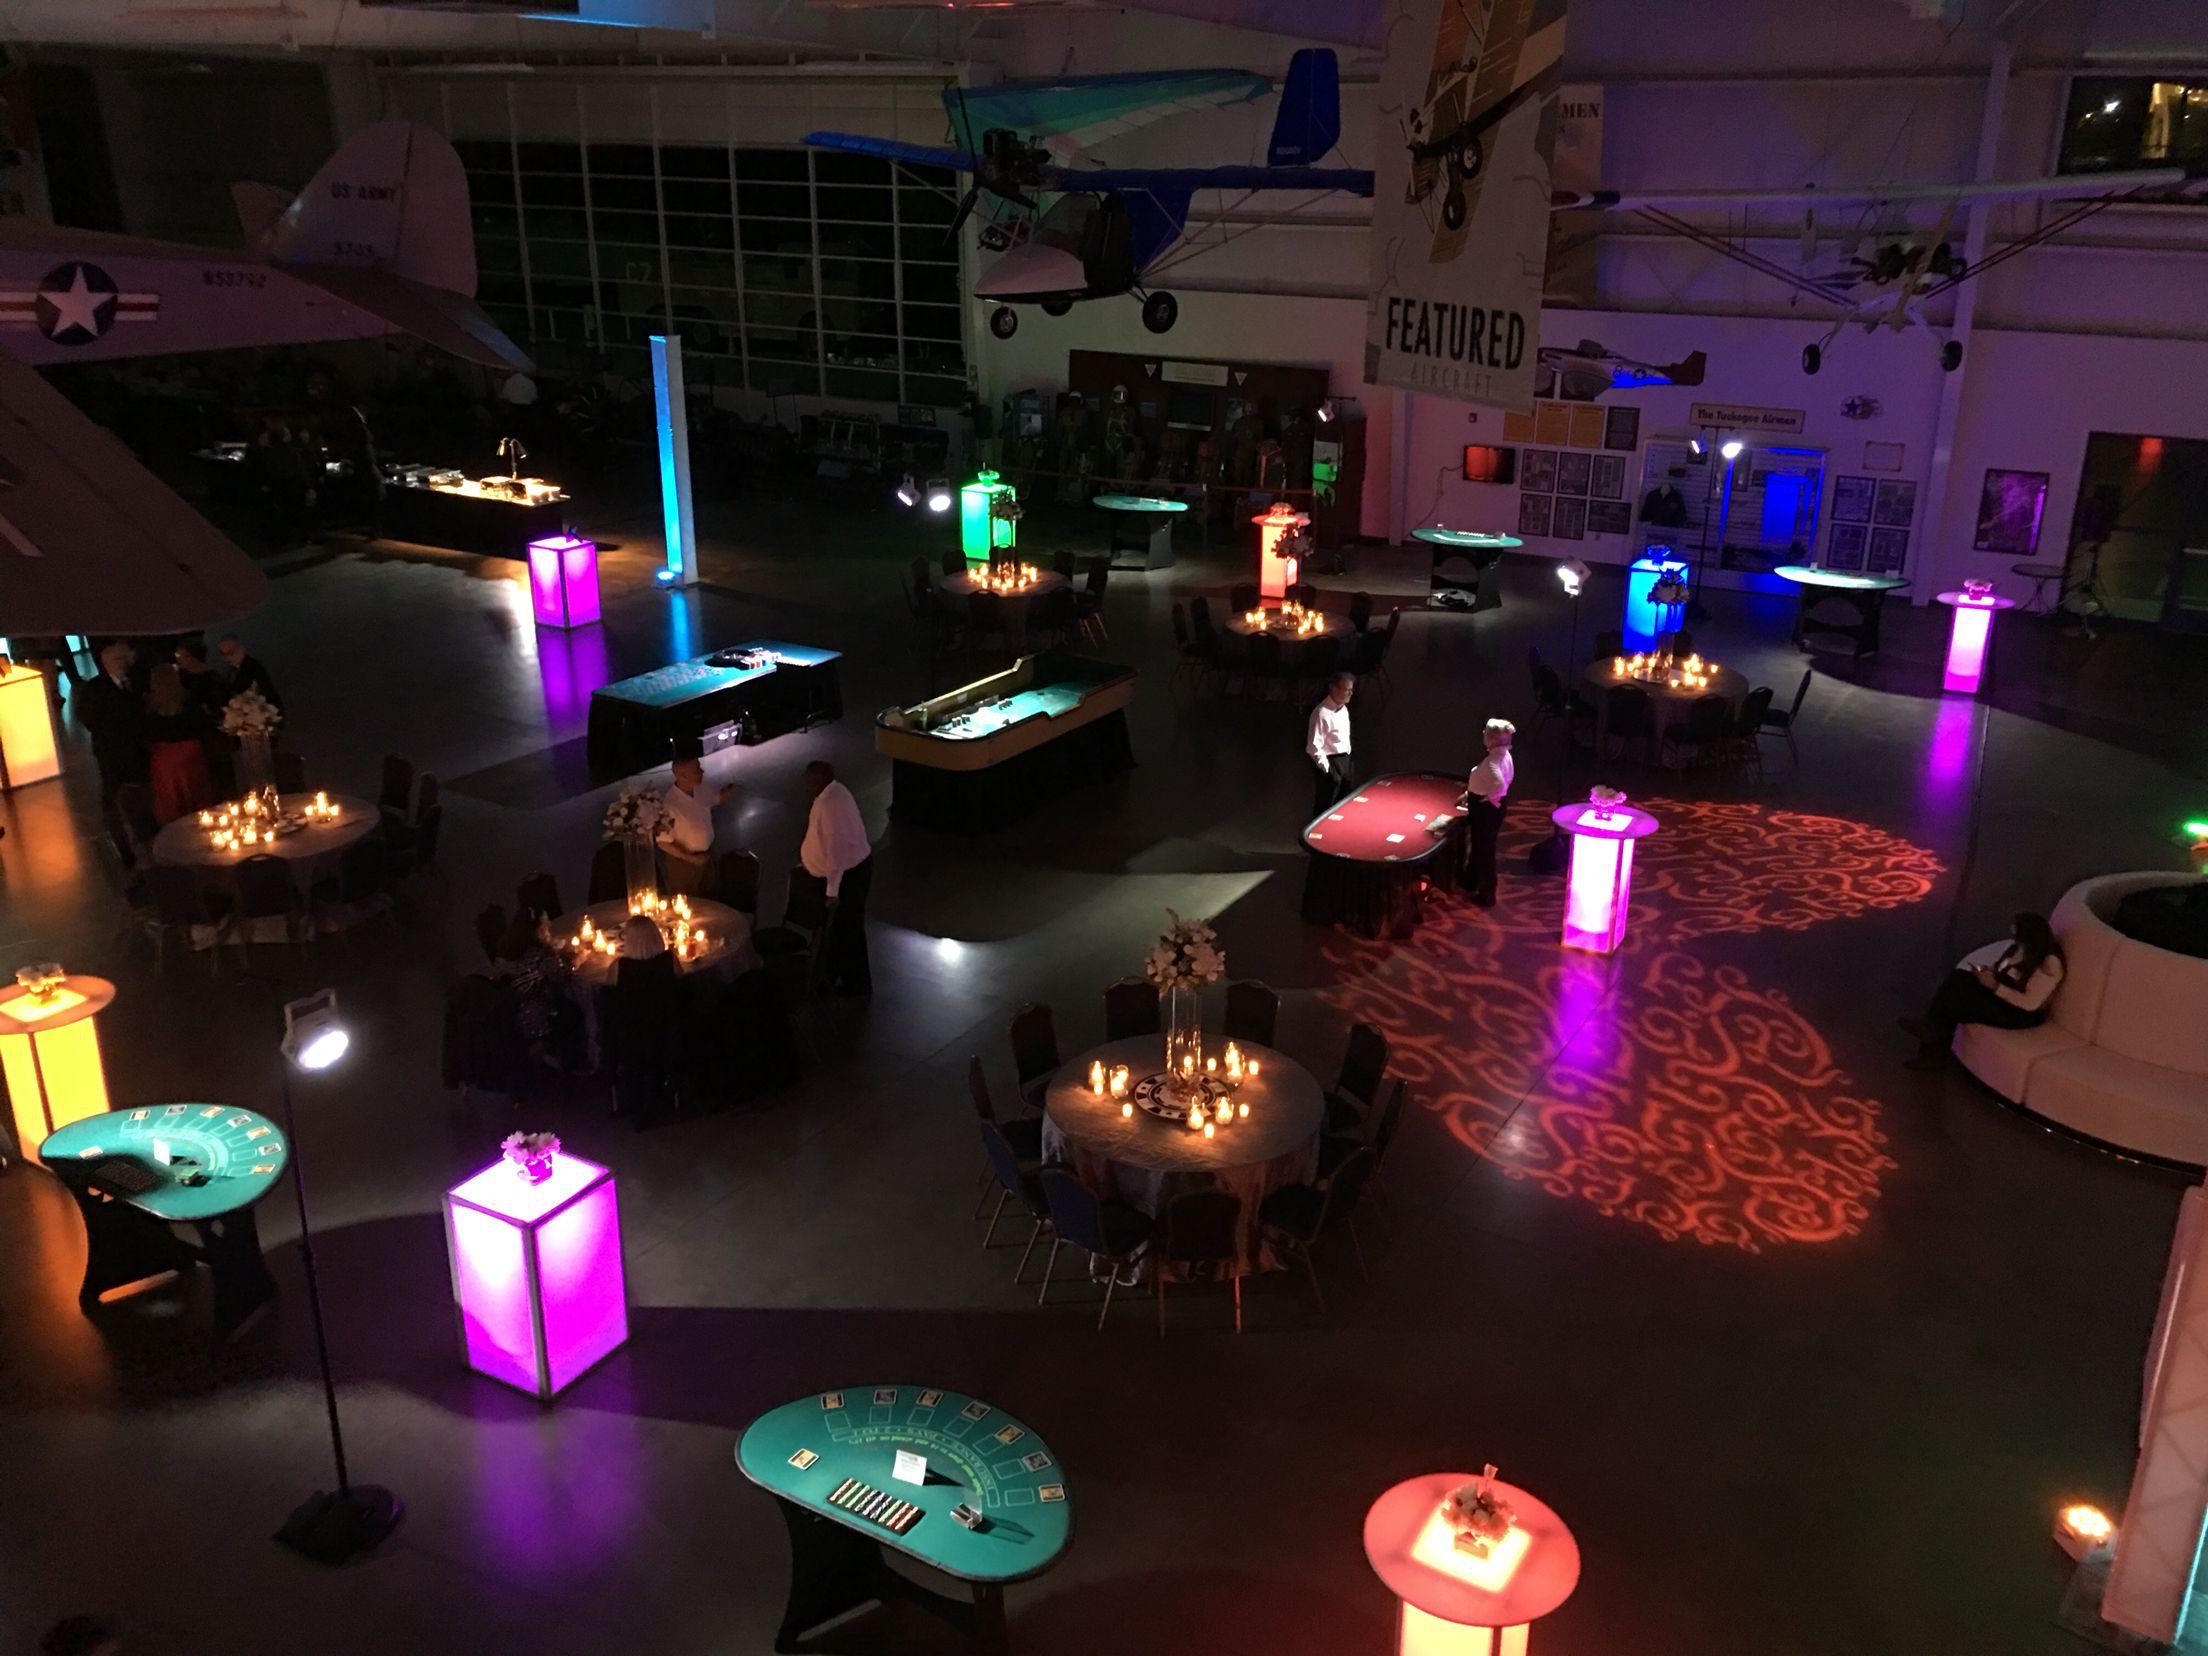 lighting and dj at ther aerospace museum sacramento ca 2015